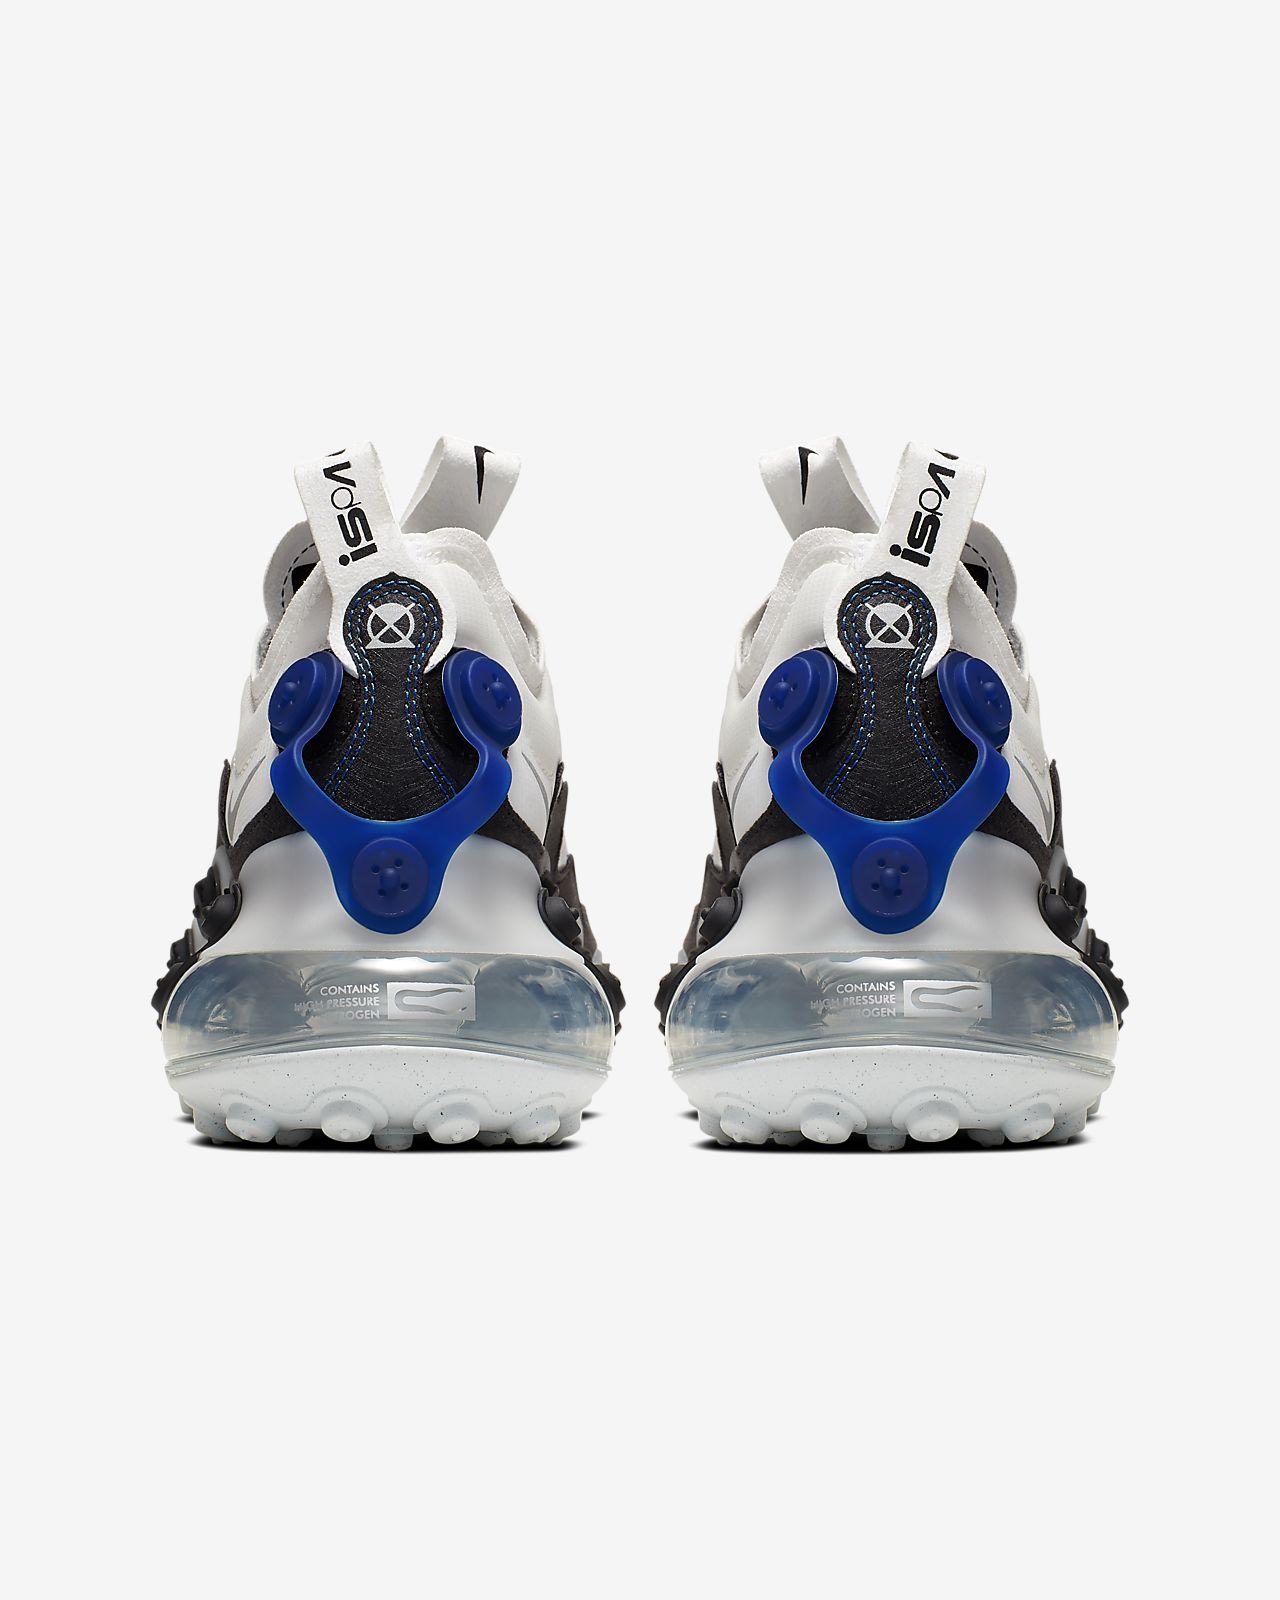 2017 Descuento Max Nike Zapatos amp; Mujer 2018 Sg Nuevo Air